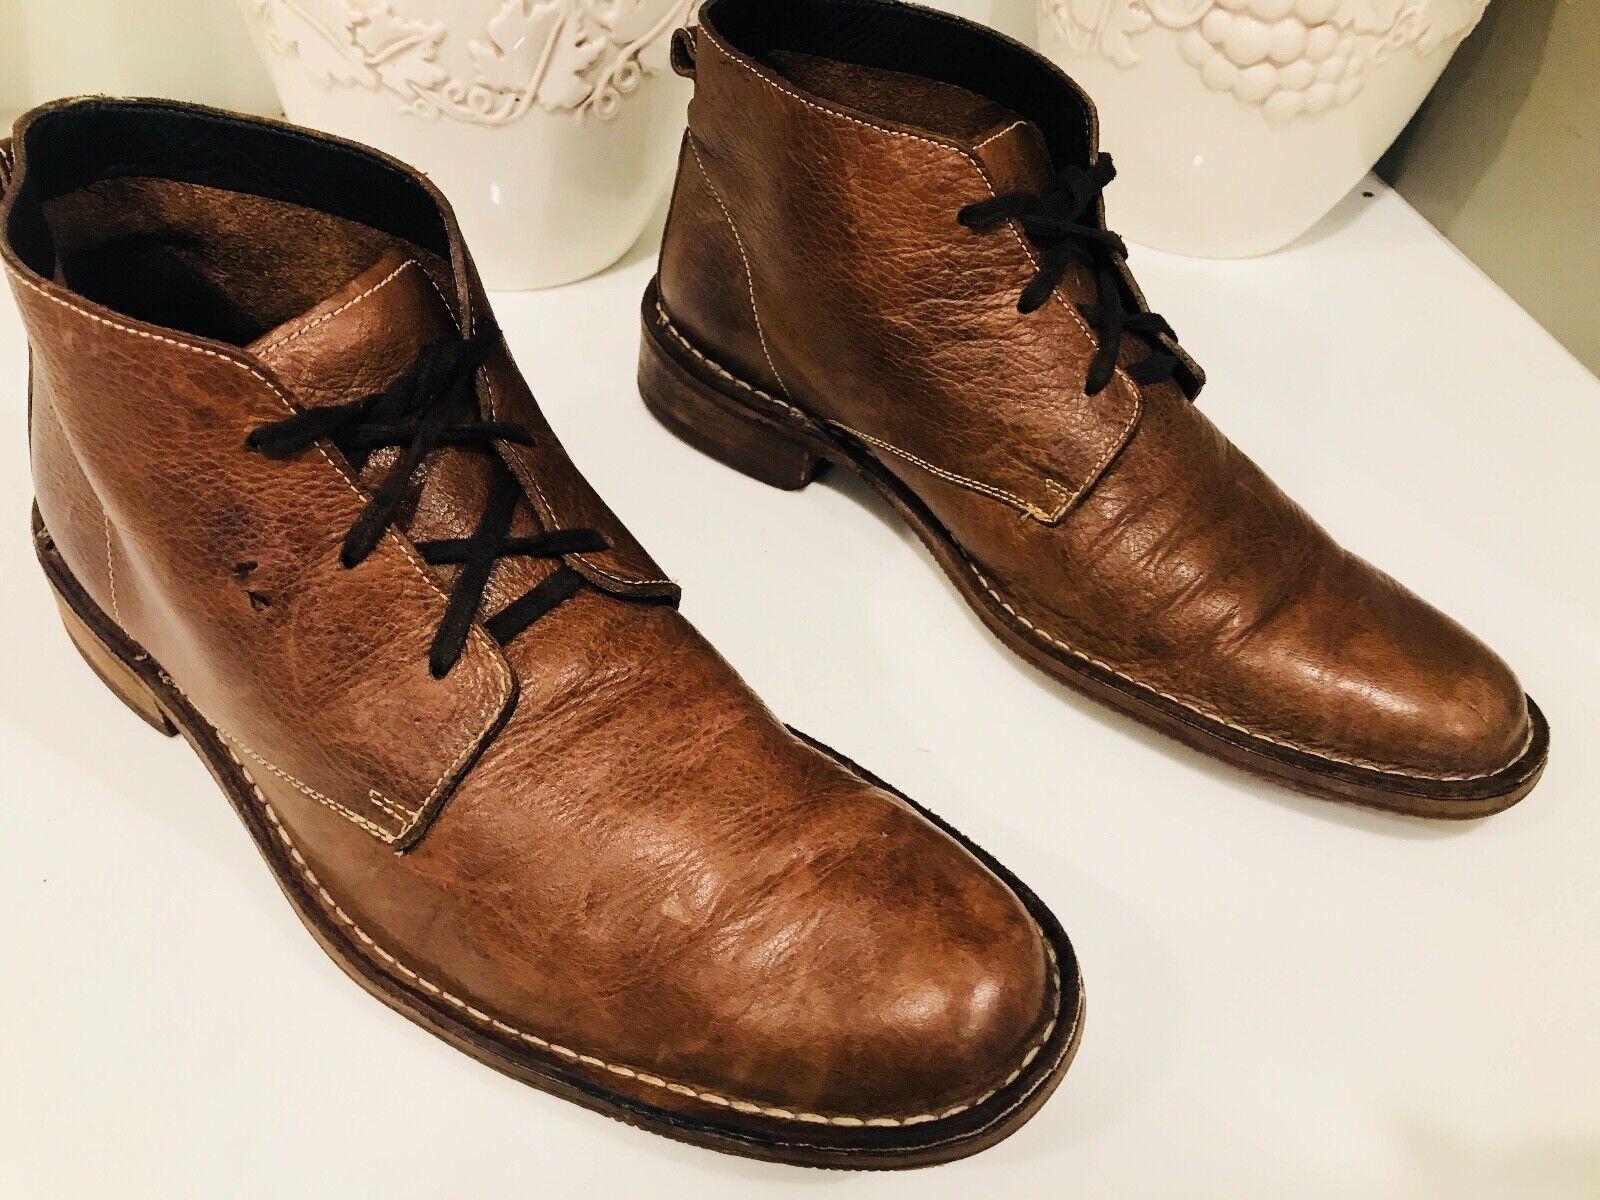 Cole Haan marrón, geneune Leather chukka, botas tobilleras de 11 metros.